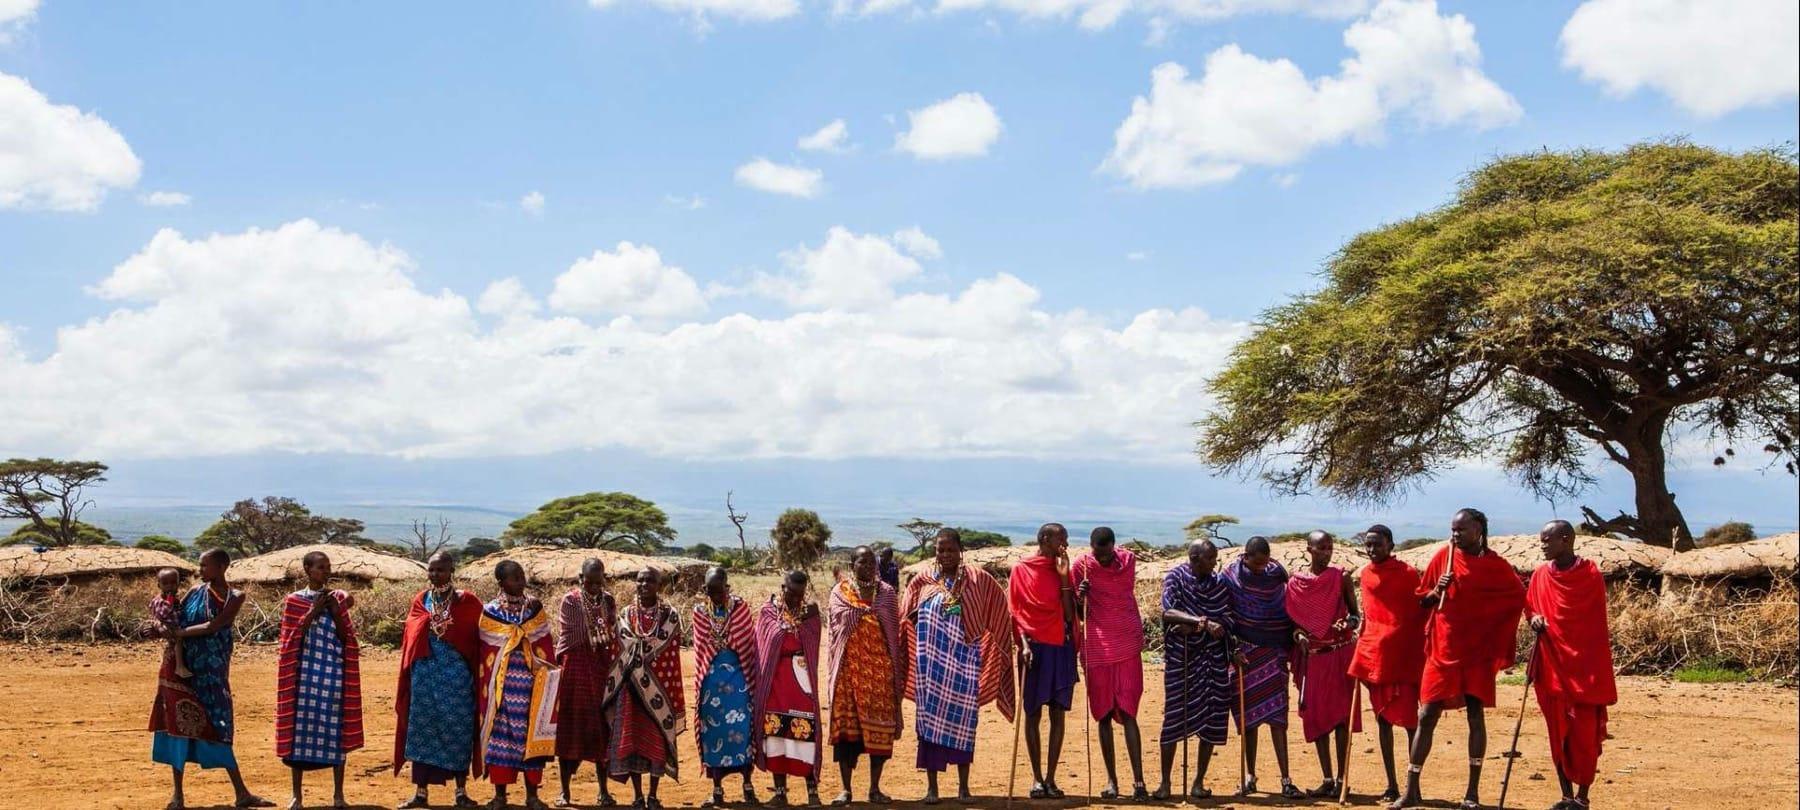 Maasai_Amboseli National Park_Kenya